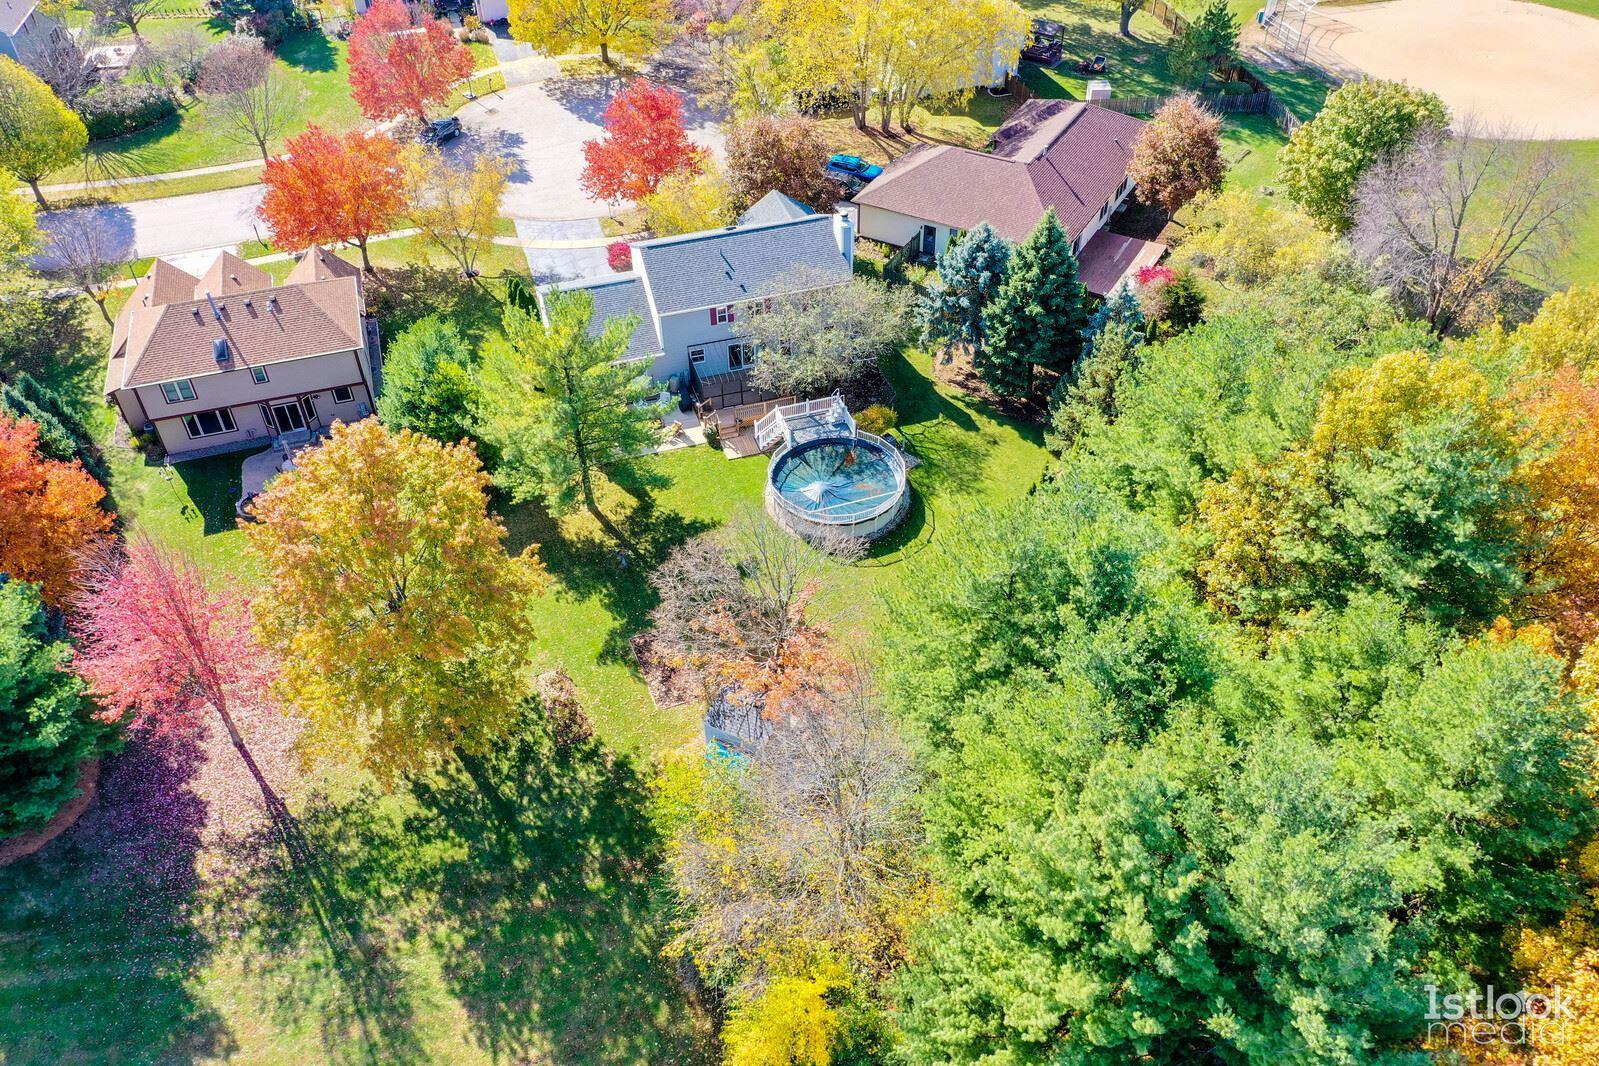 Photo of 311 Landshire Court, Oswego, IL 60543 (MLS # 10916431)